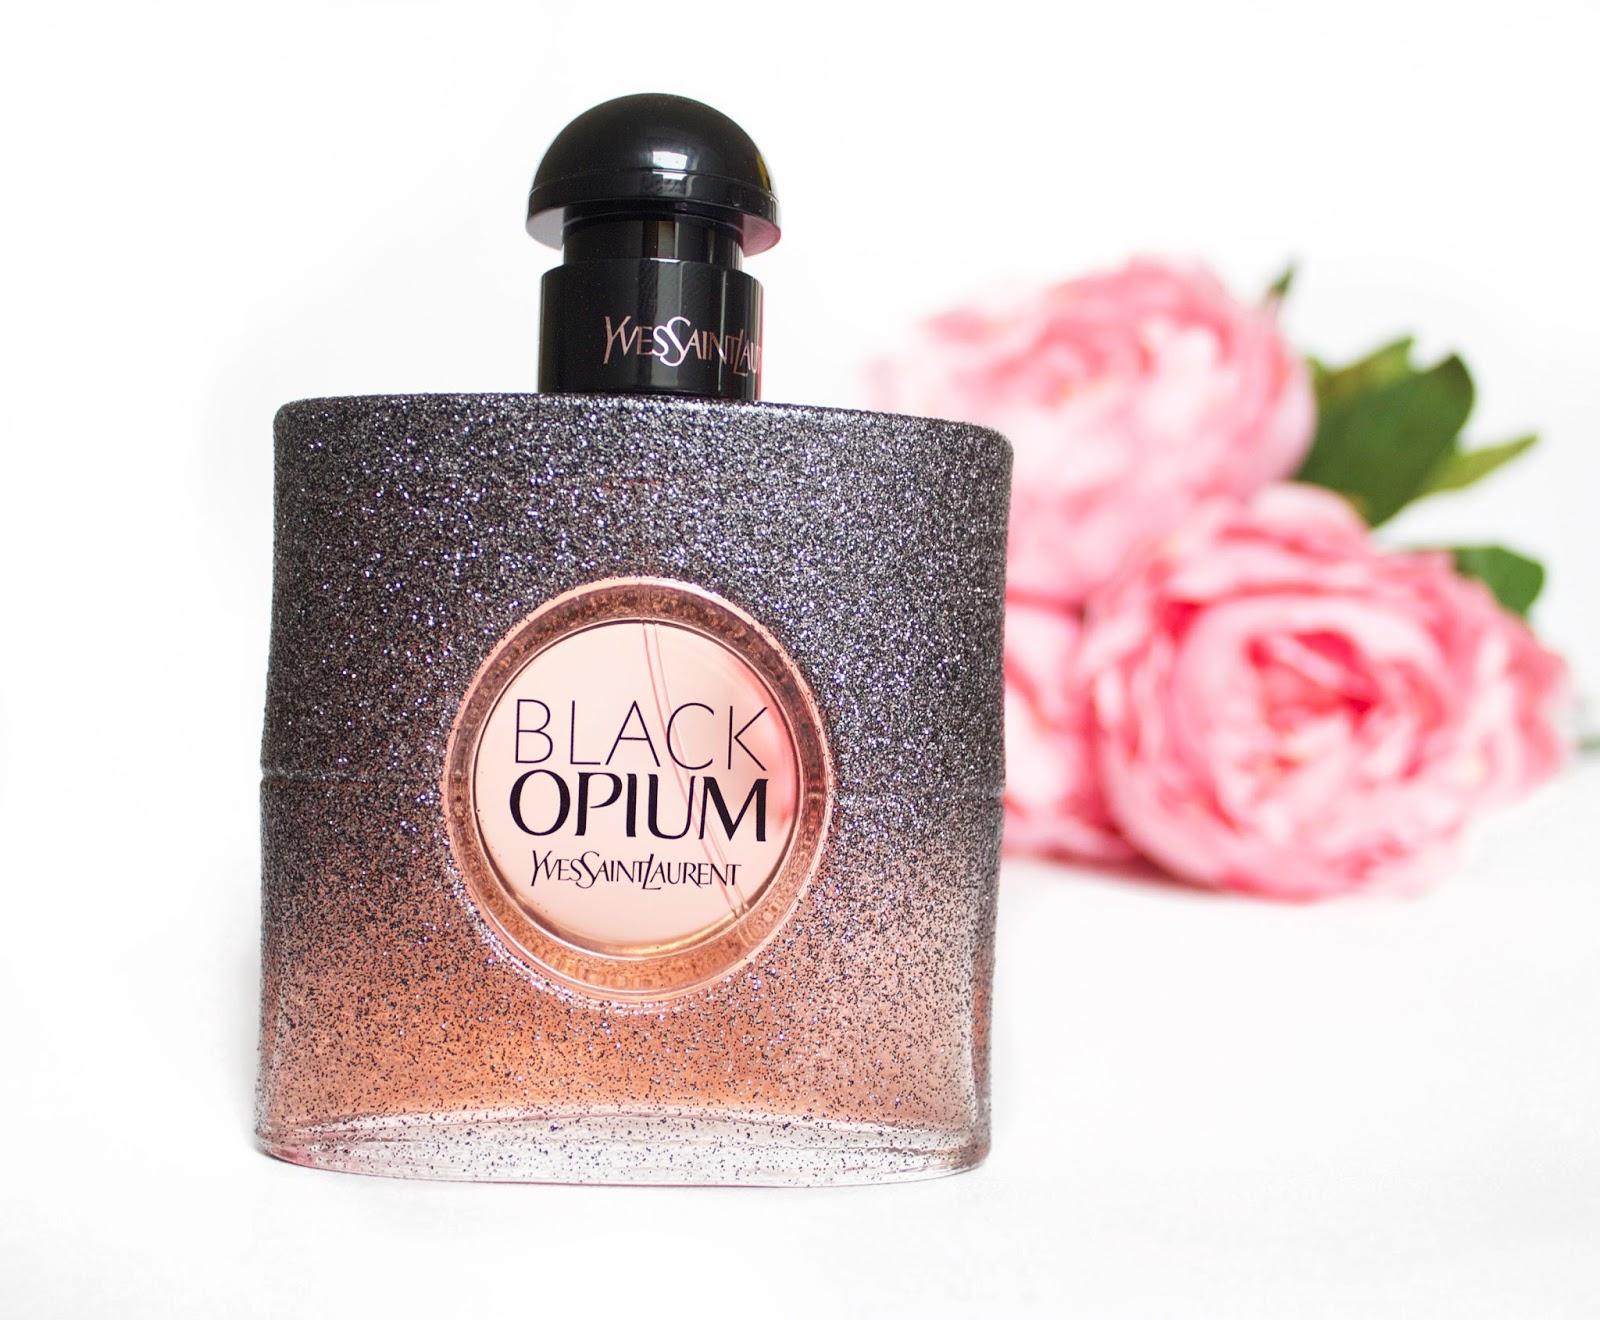 Ysl Black Opium Floral Shock Perfume Live Laugh Lipstick Bloglovin